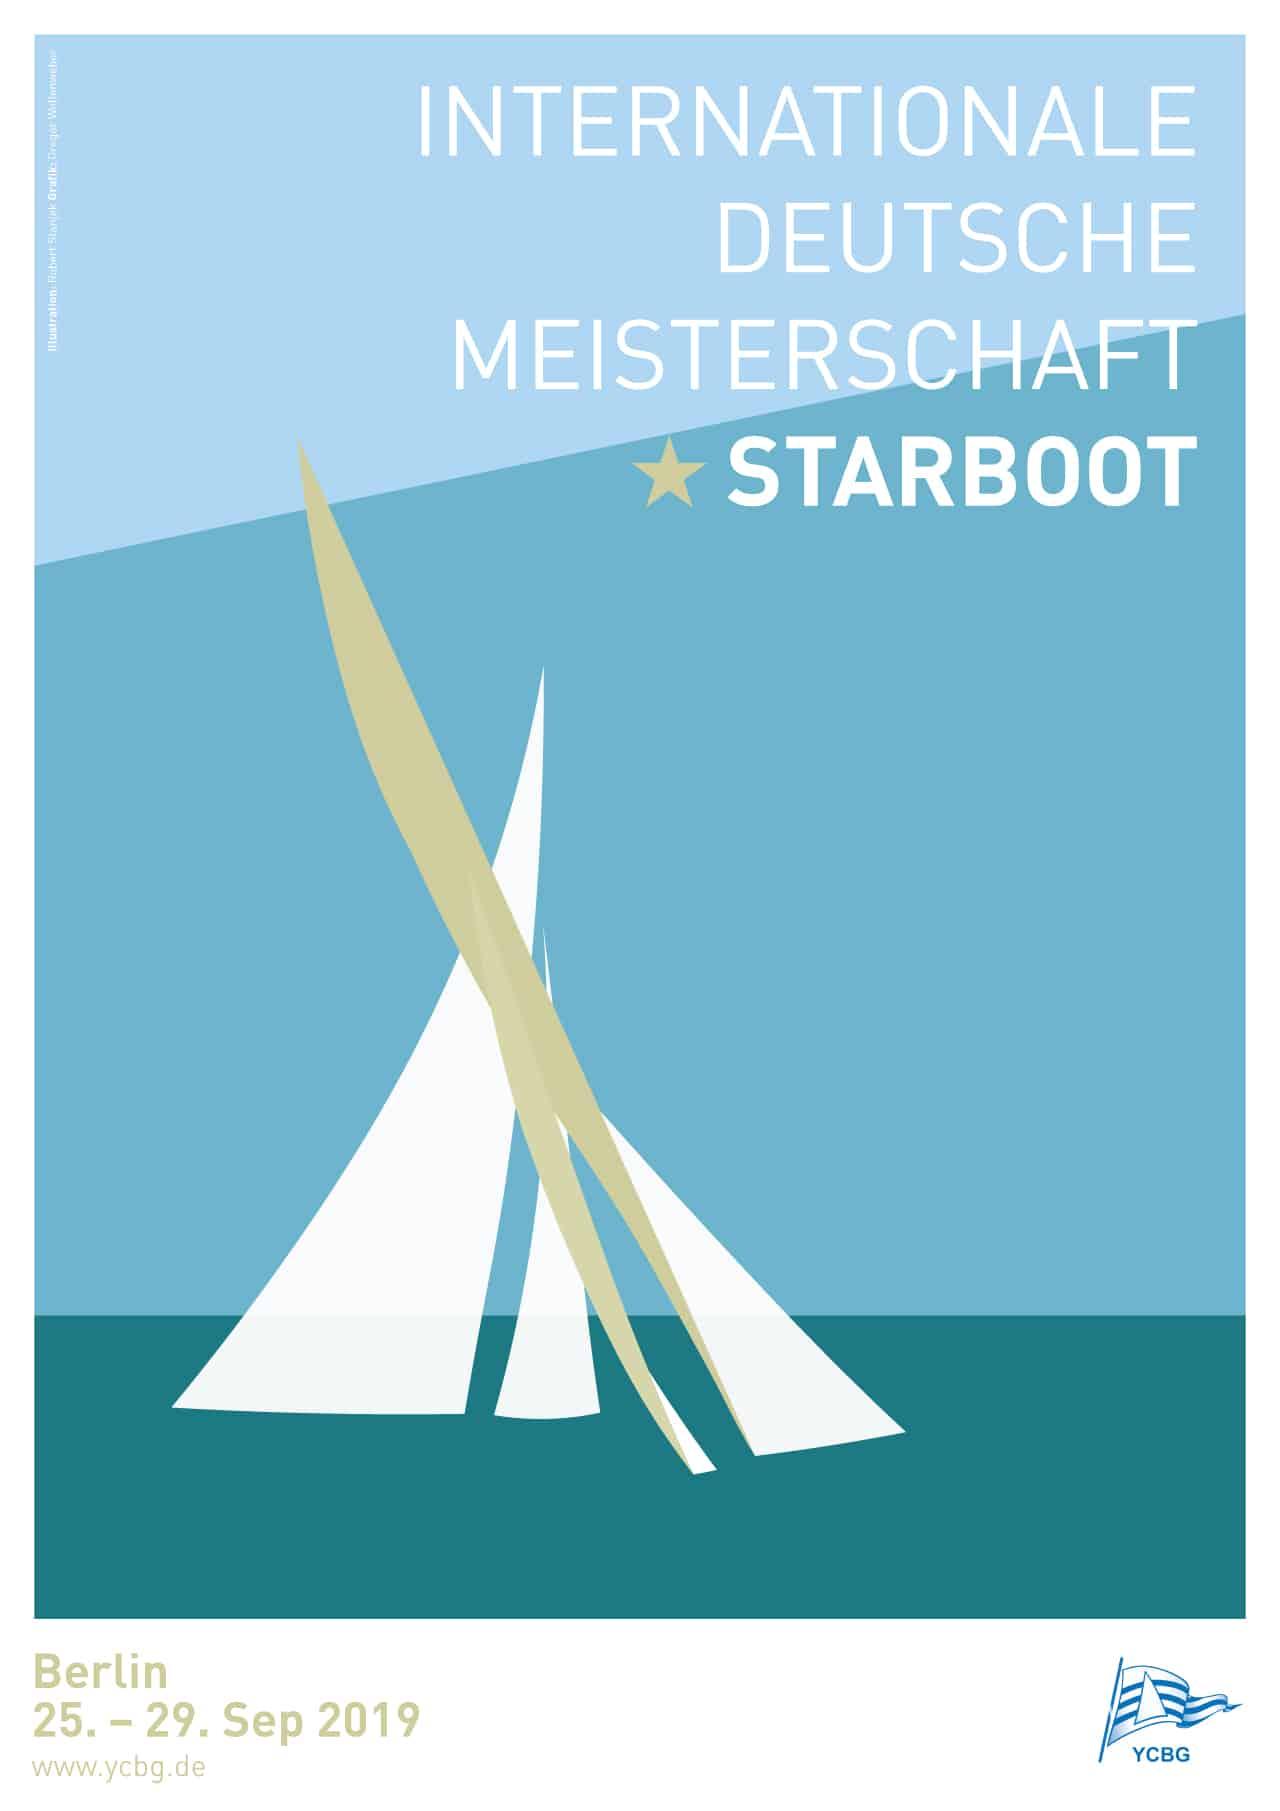 Starboot Idm 2019 Web